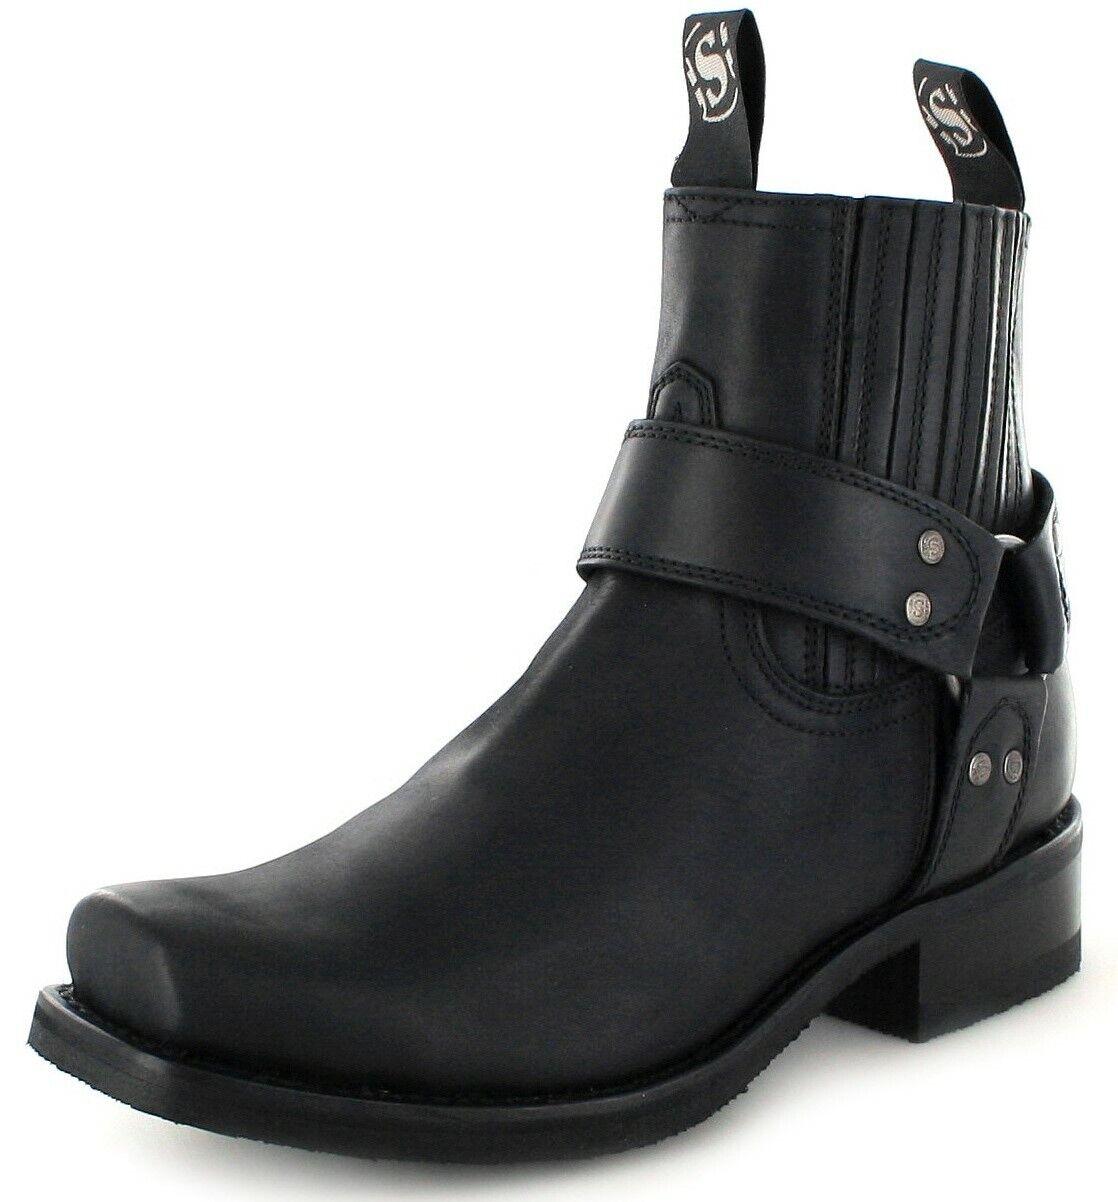 Sendra Boots 8286 Loren black Bikerstiefelette Motorradstiefelette